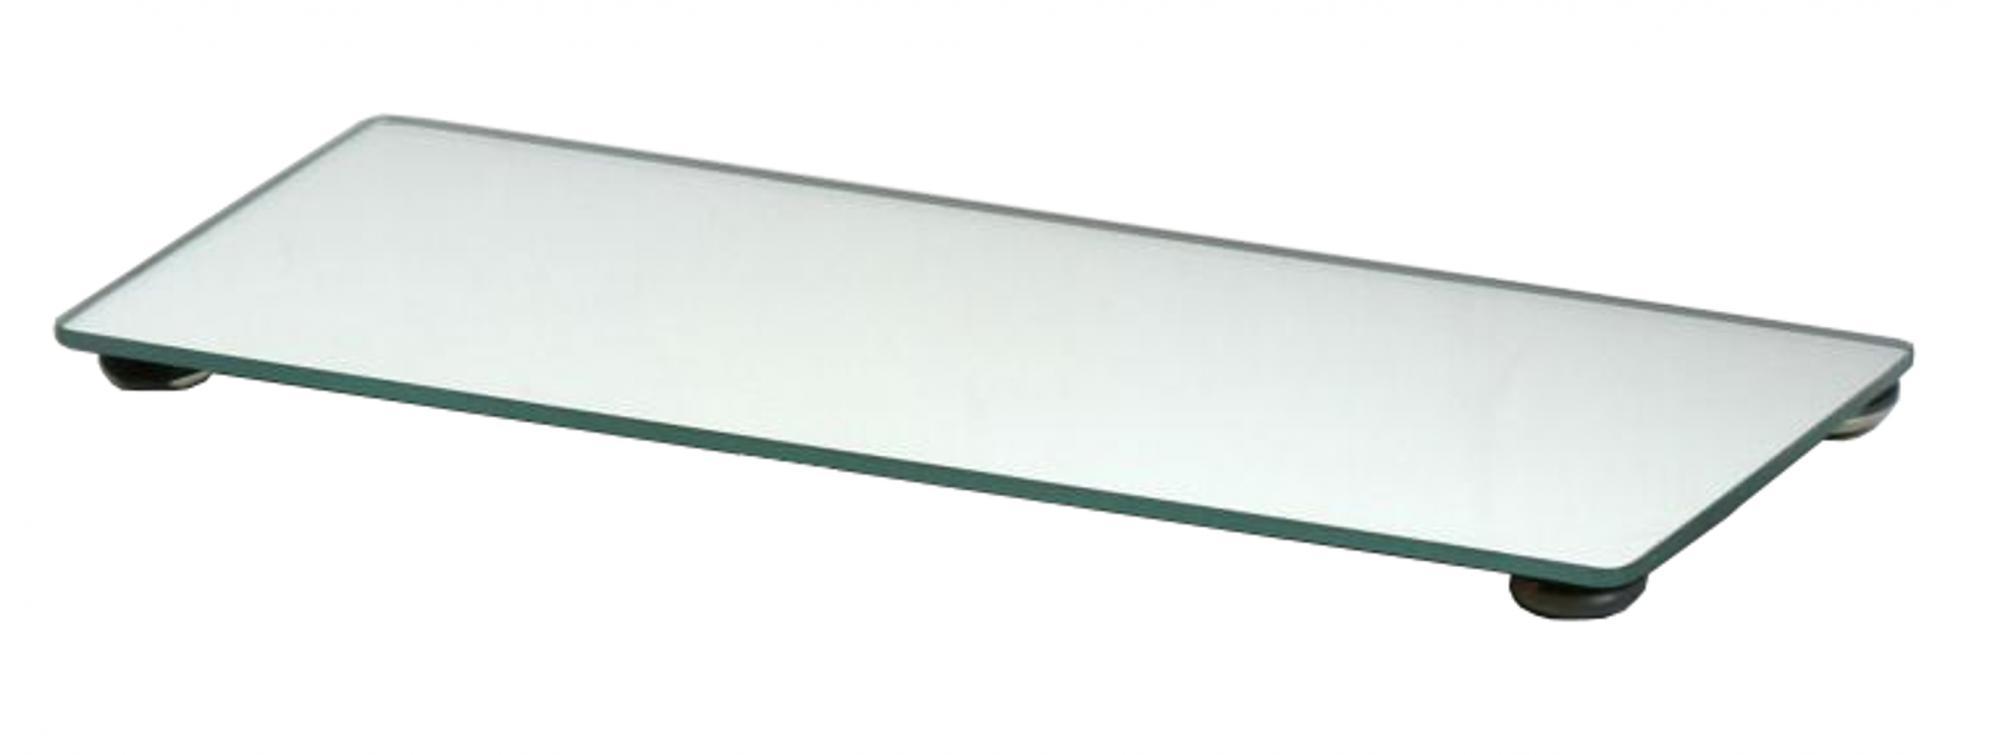 Bandeja de Vidro Retangular - Espelho